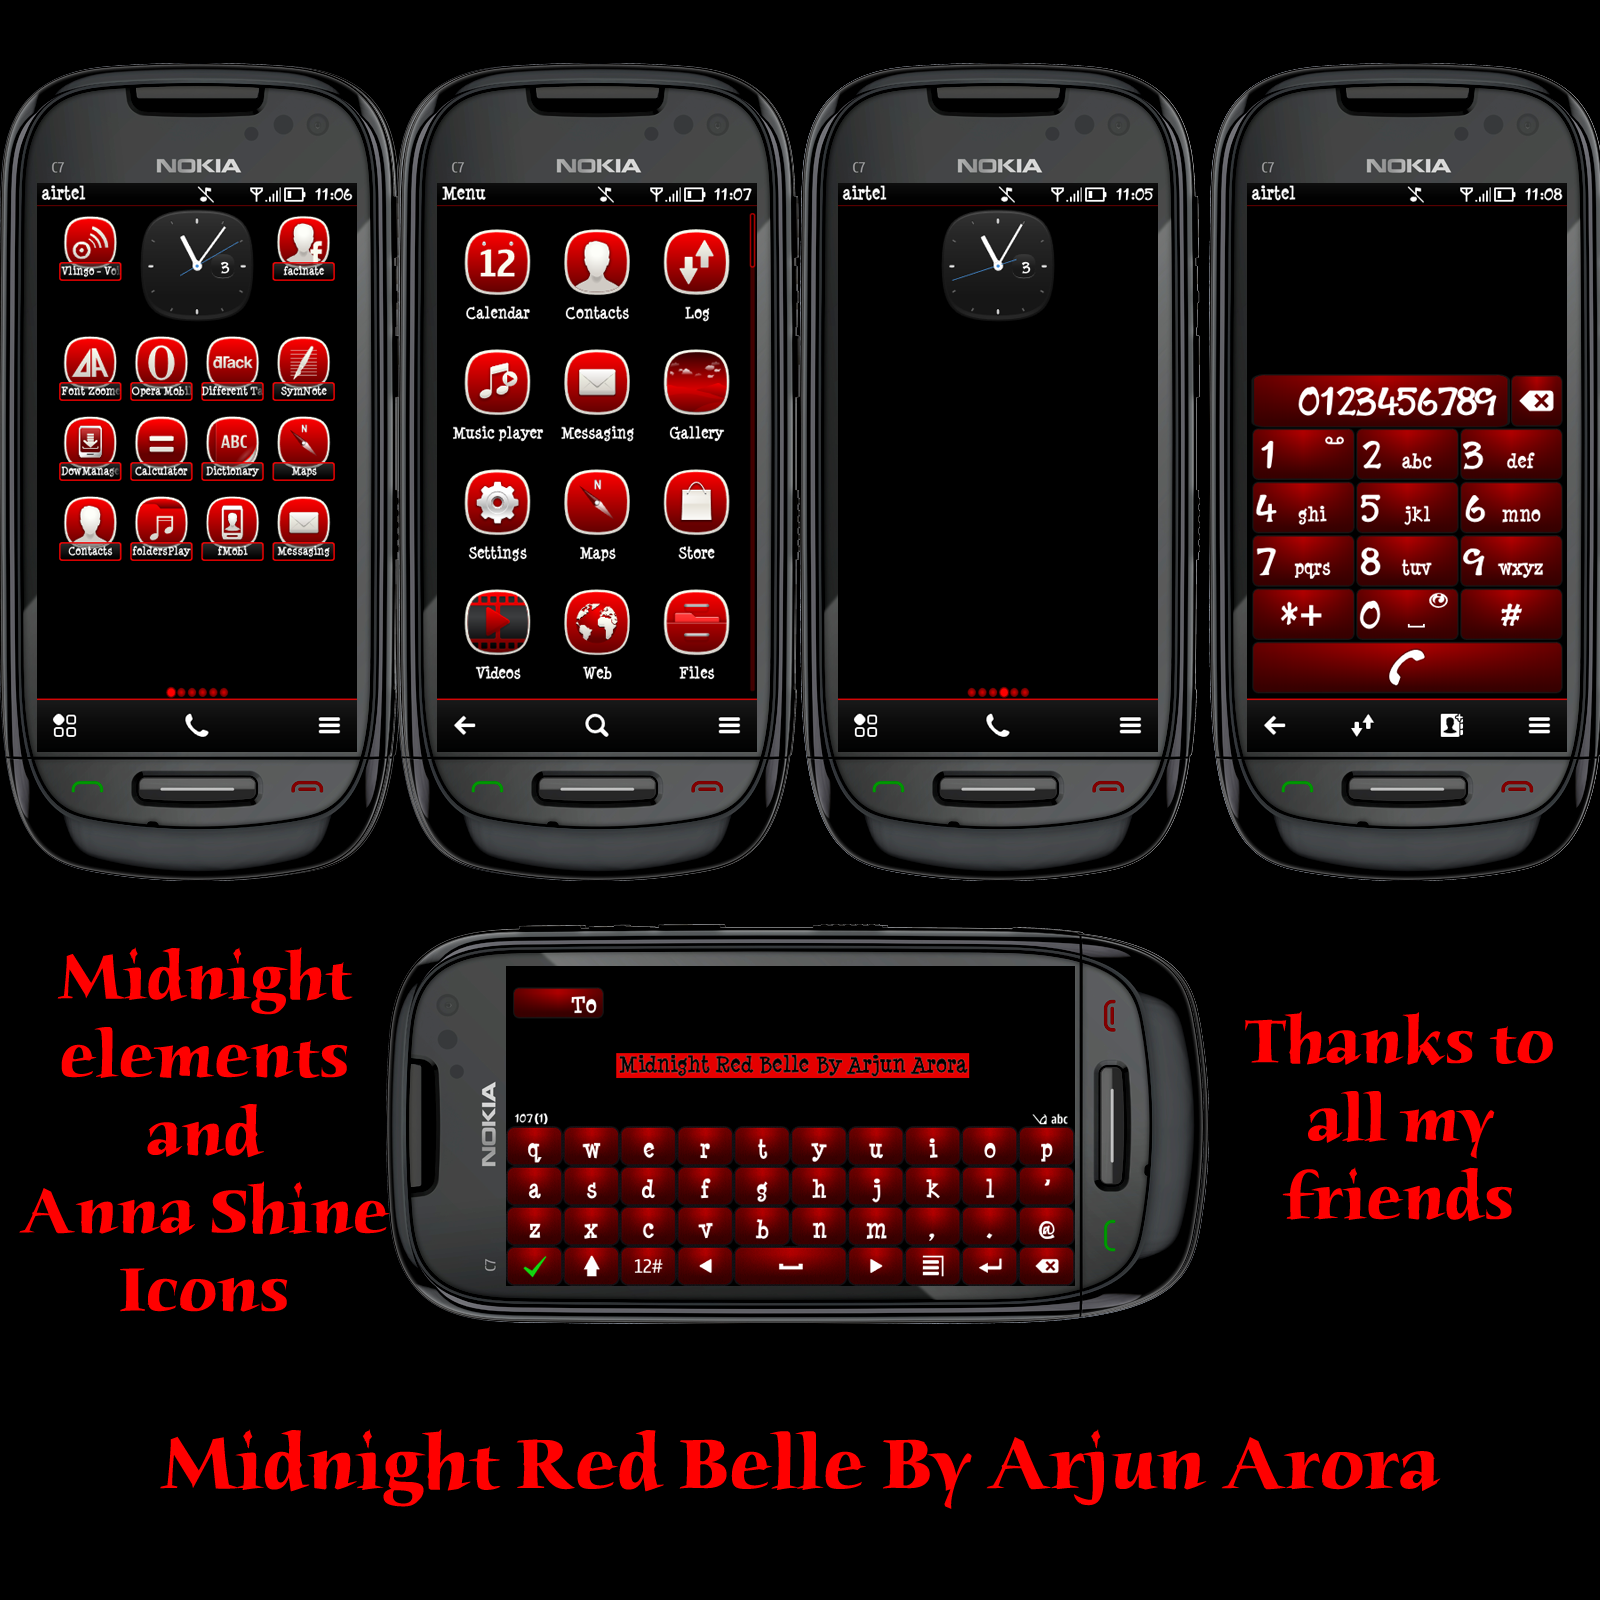 http://2.bp.blogspot.com/-GvMbvySzPHY/T2Ahj5k4X3I/AAAAAAAAAQ0/IlQDU8hnXes/s1600/Midnight-Red-Nokia-1.png